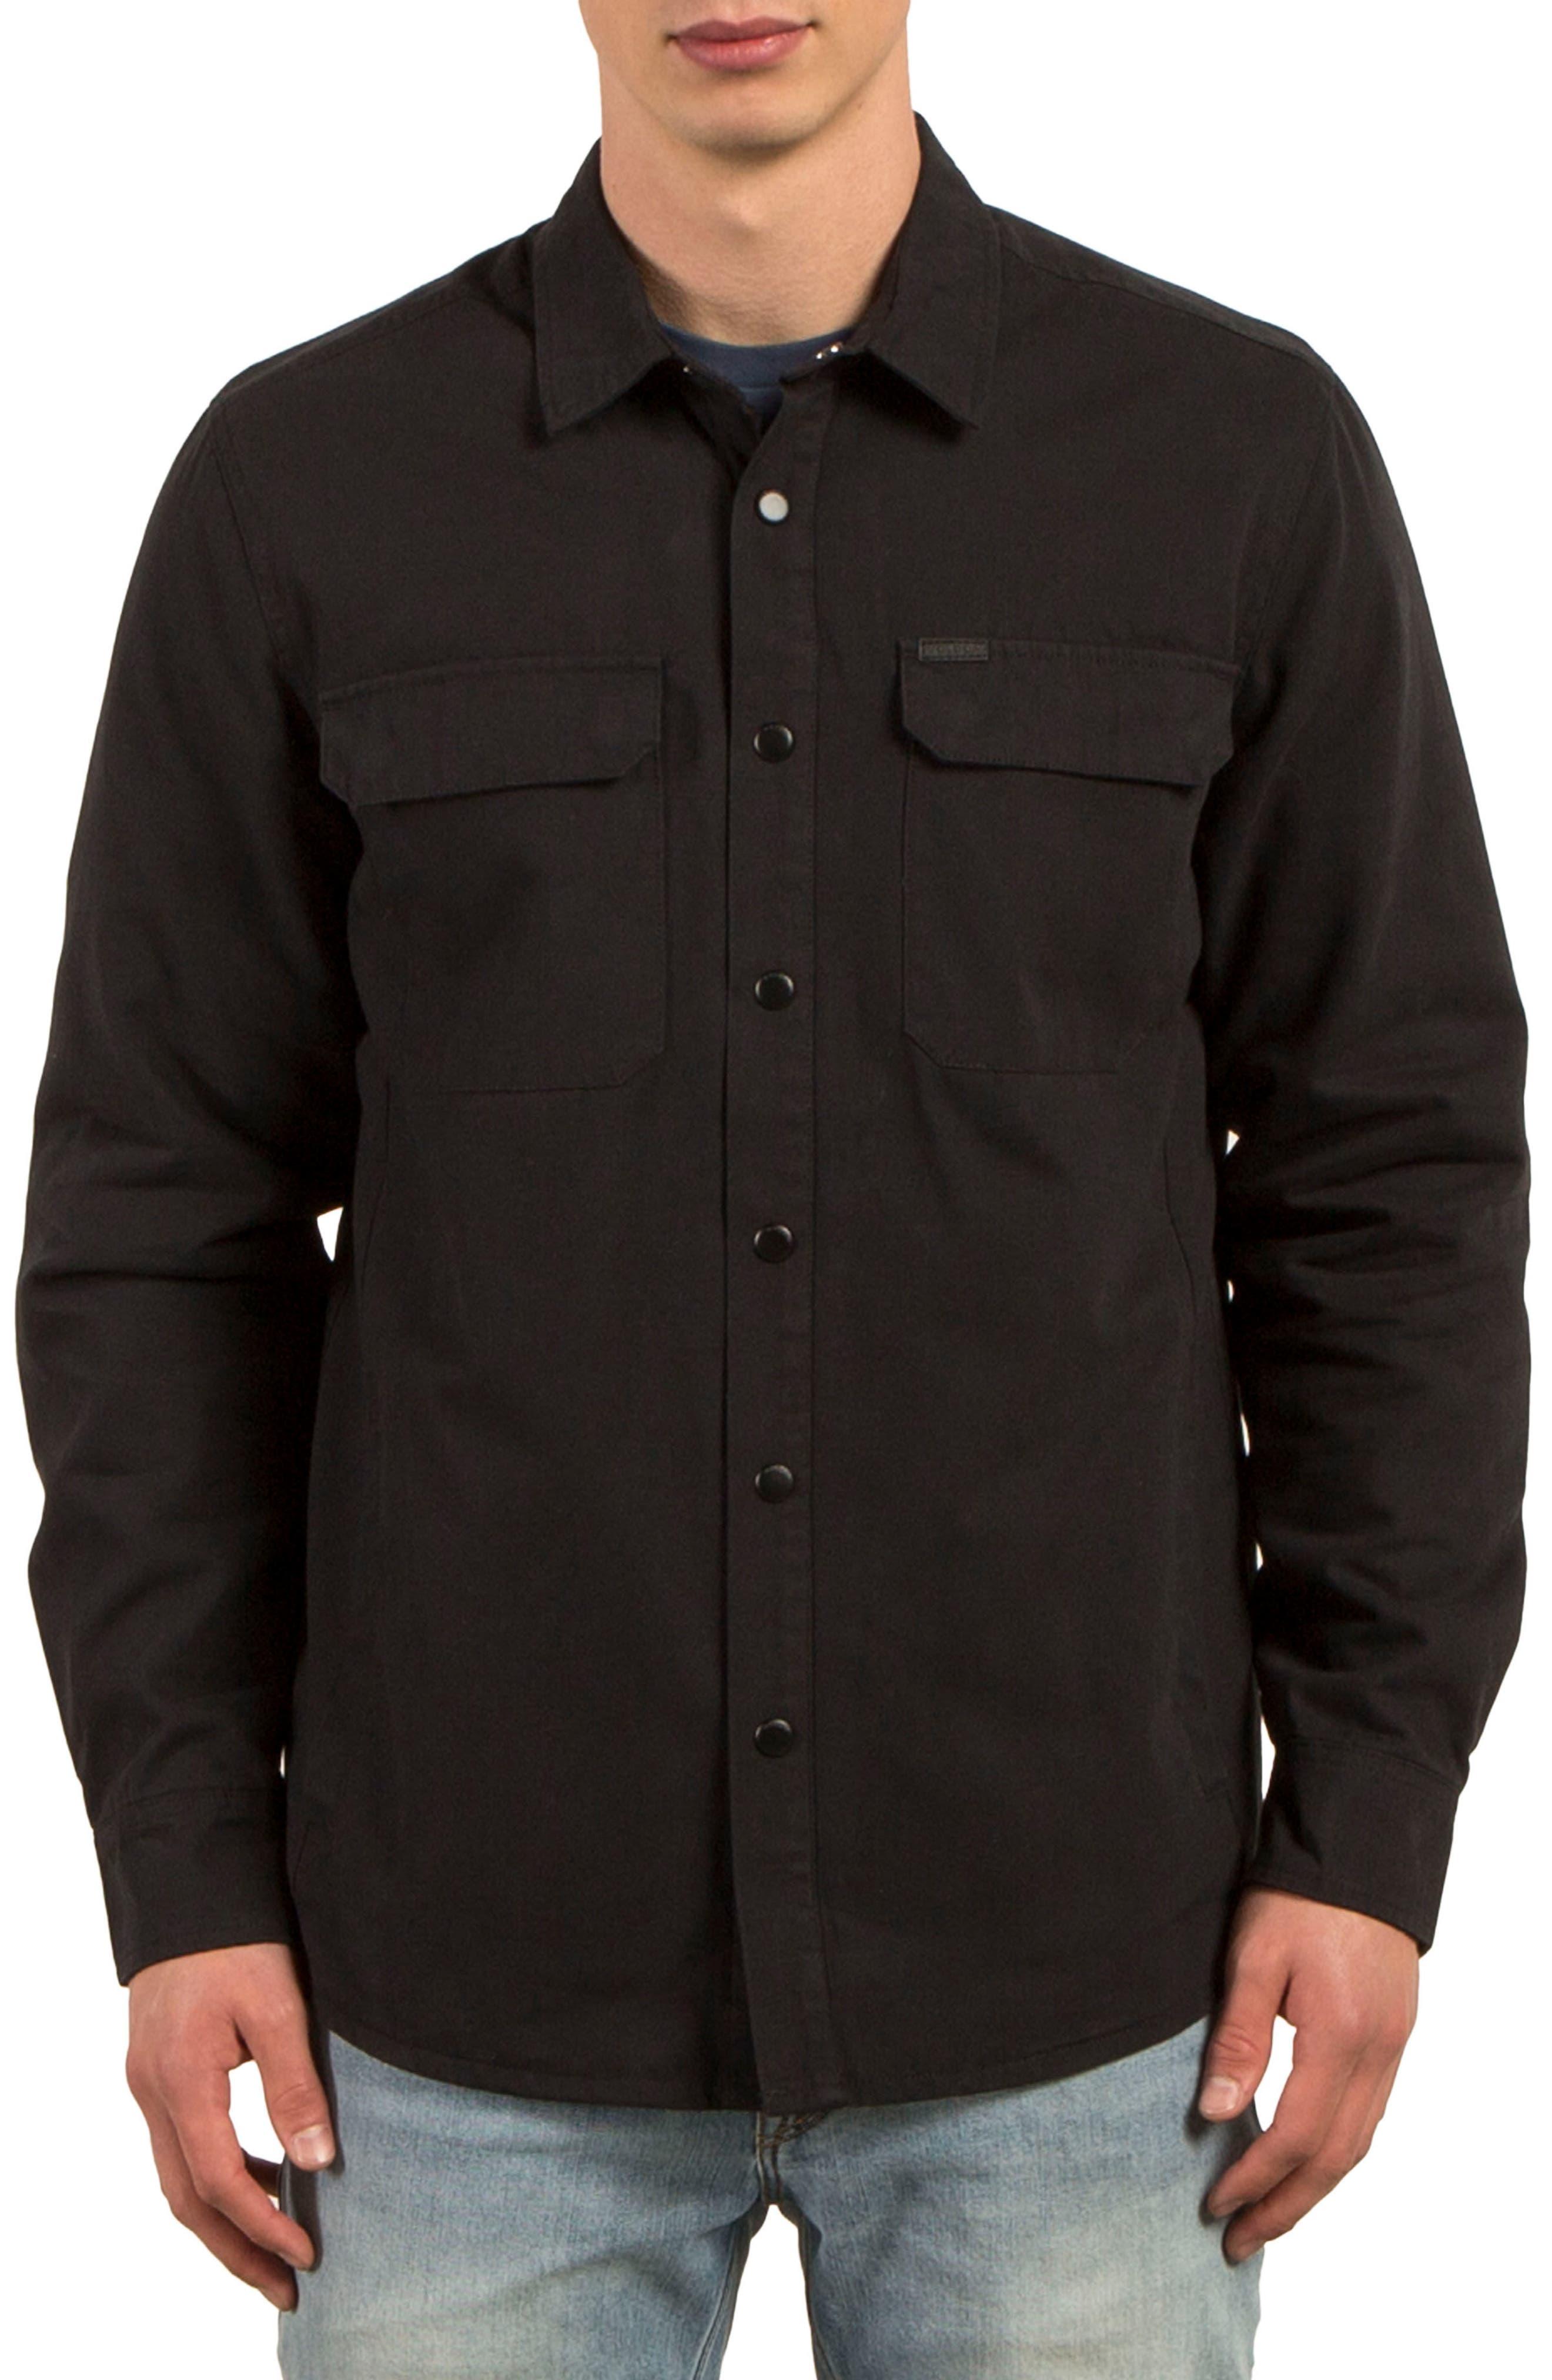 Larkin Classic Fit Jacket,                             Main thumbnail 1, color,